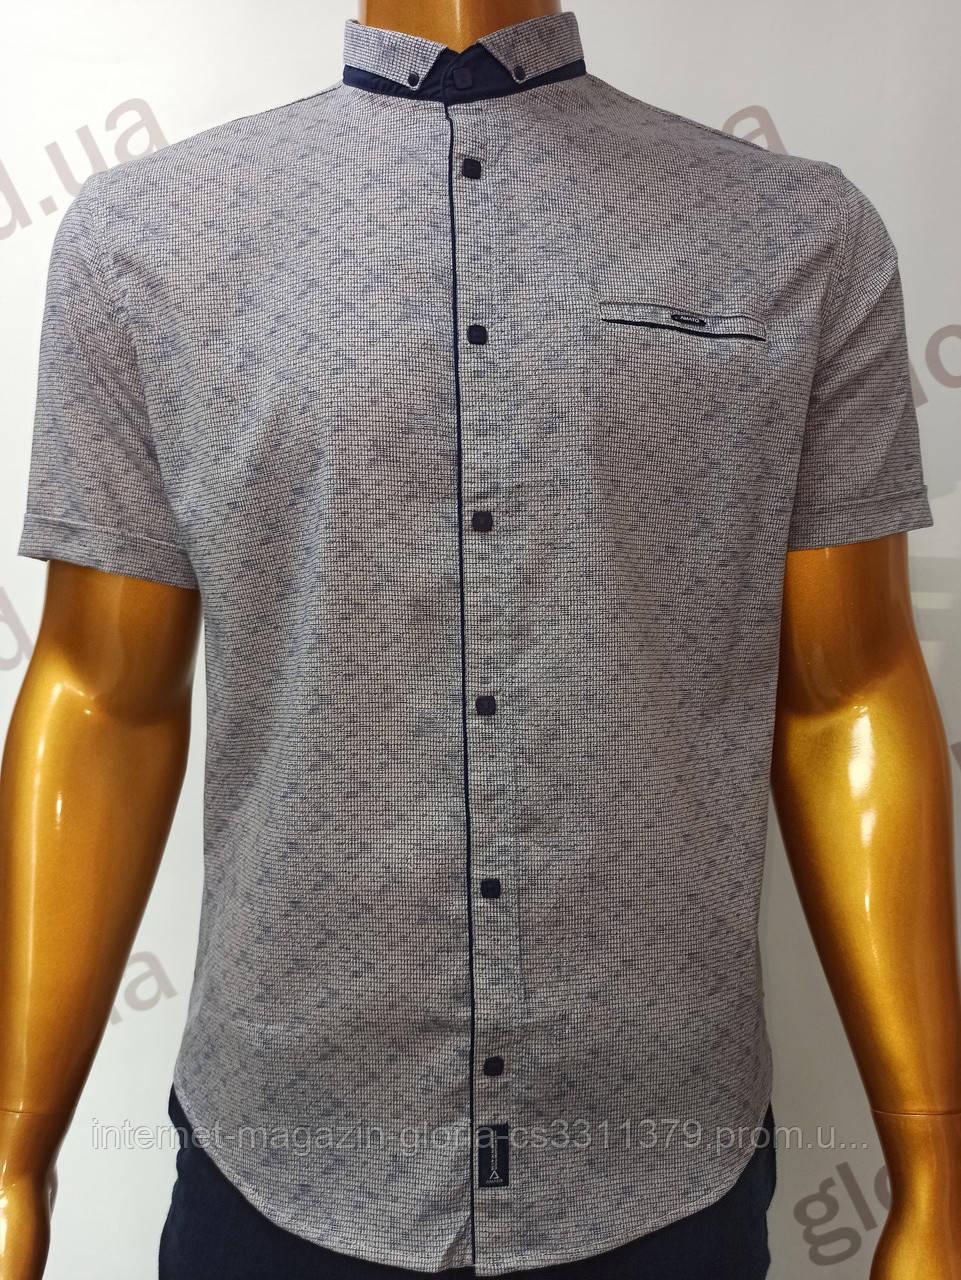 Мужская рубашка Amato. AG.19726-2(b). Размеры:L,XL(2), XXL.